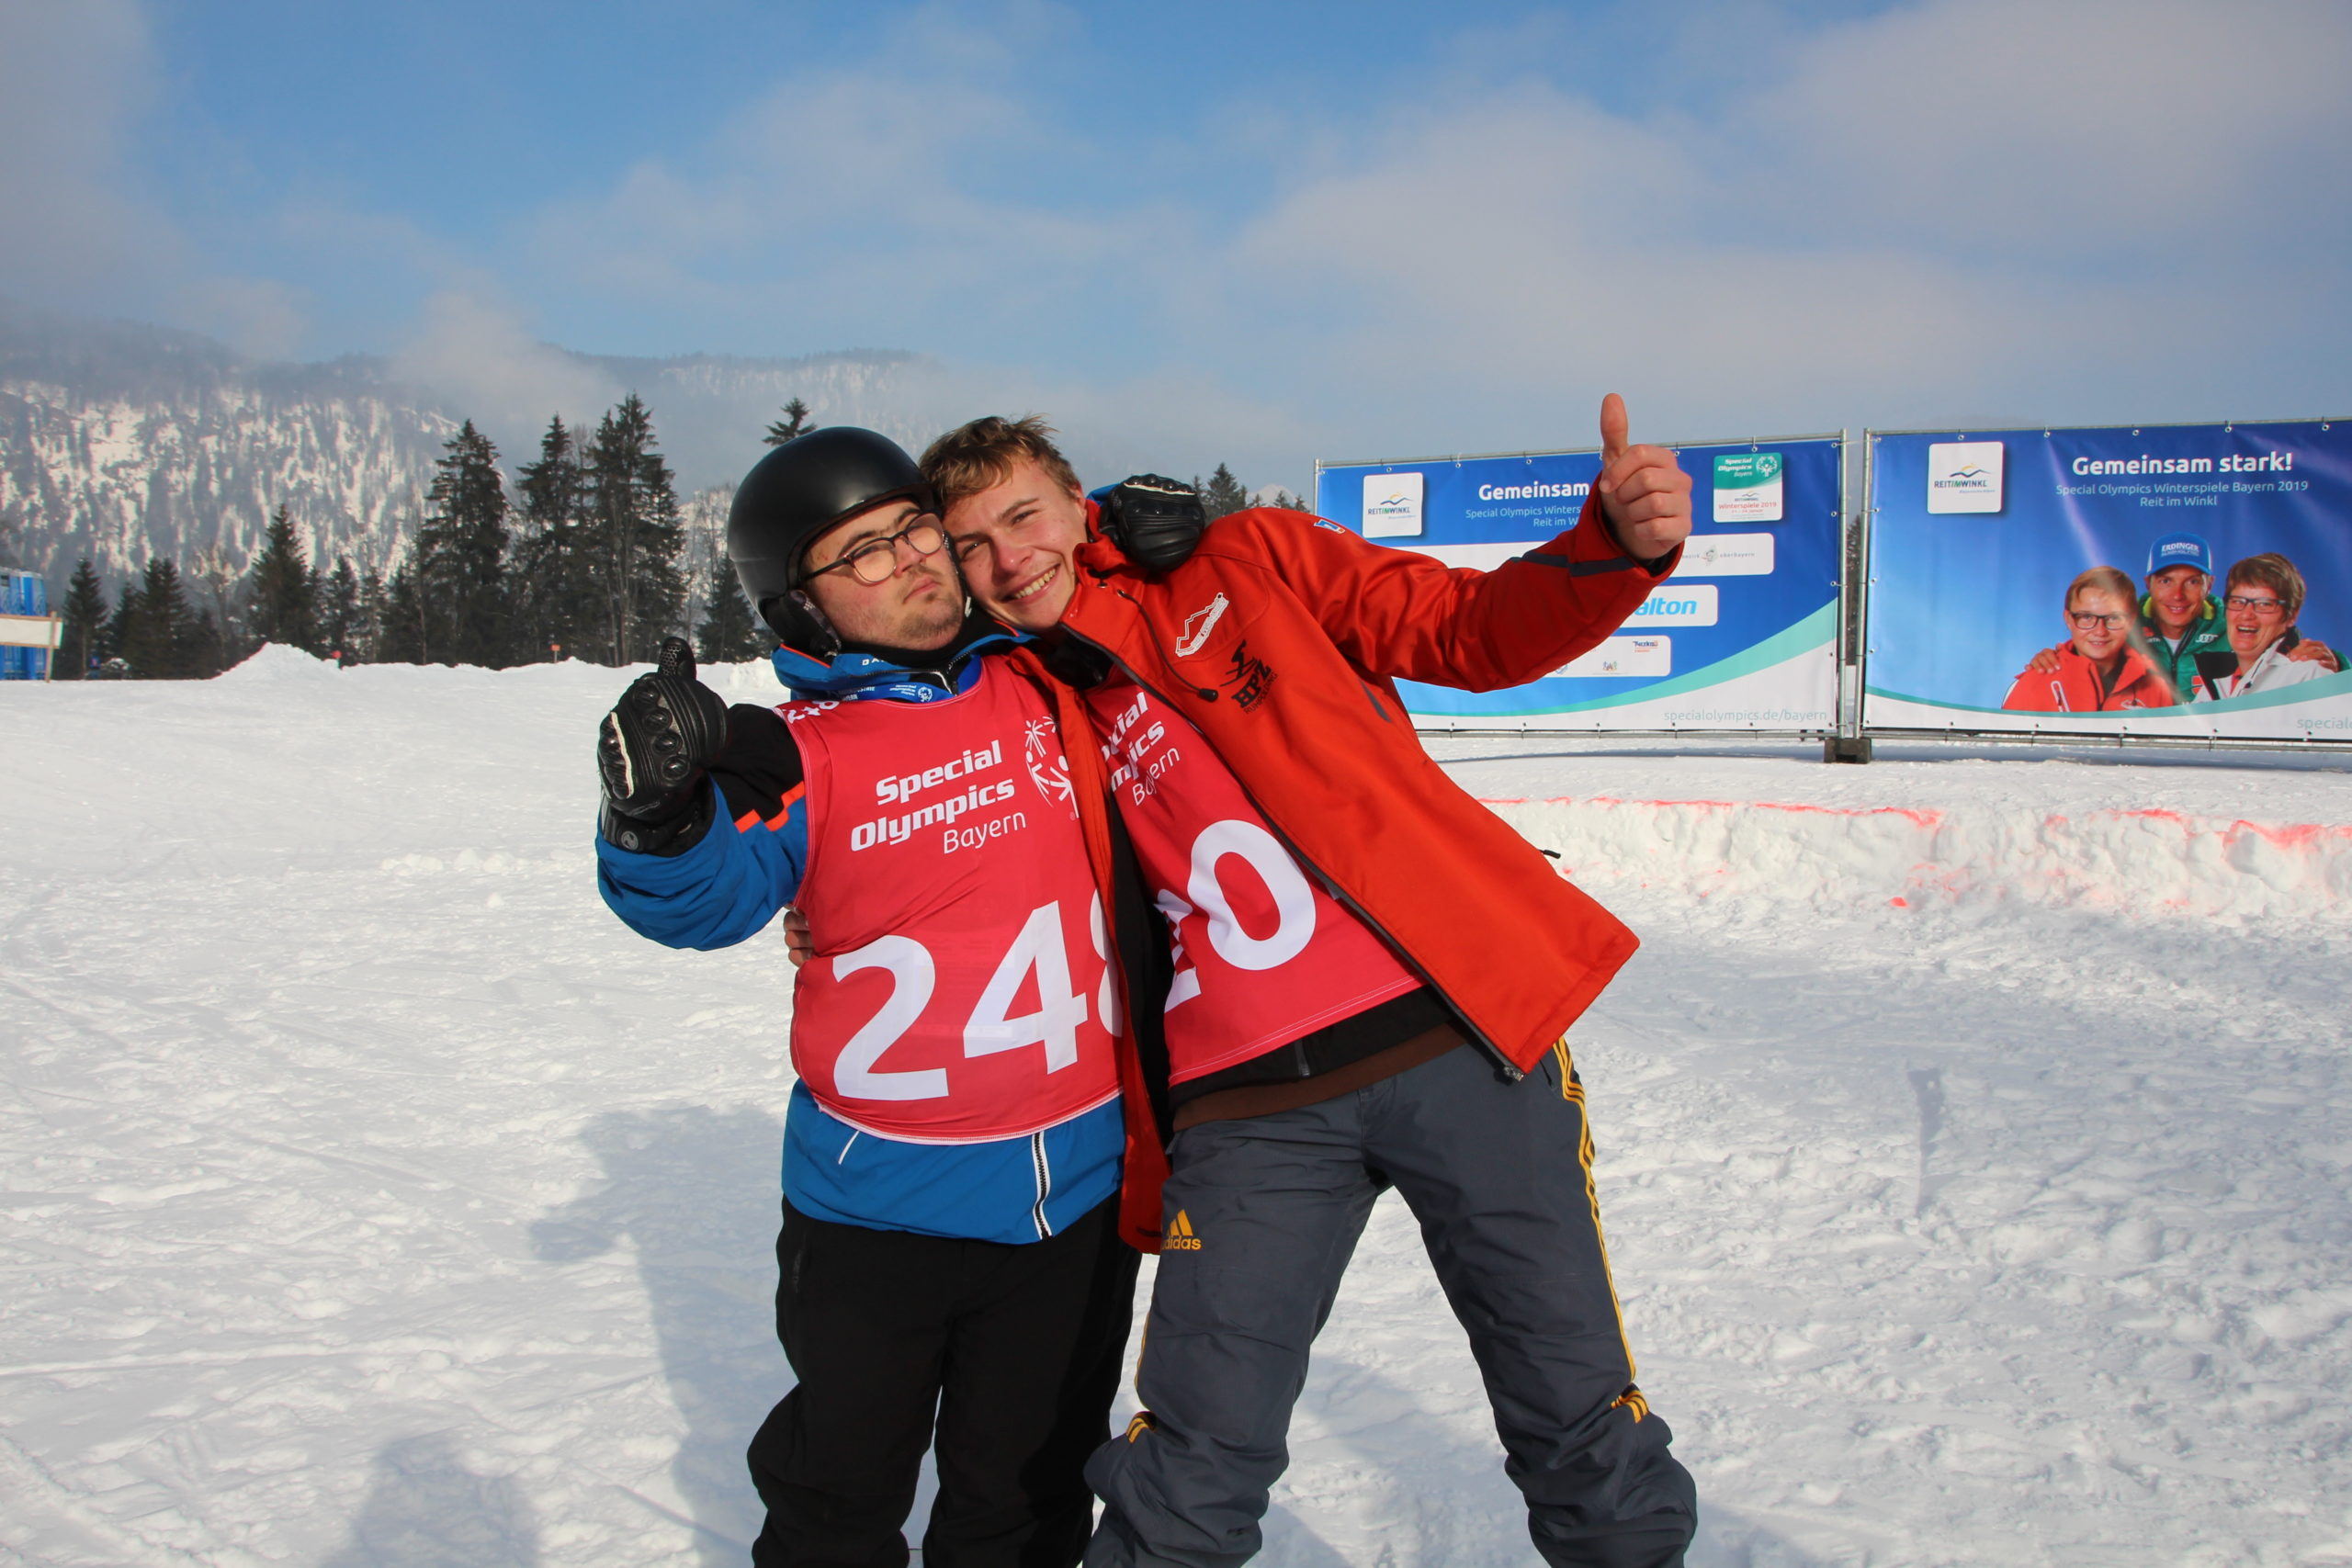 RiW2019_Ski-Alpin_190122 (SOBY, Johanna Hilgarth) (119)